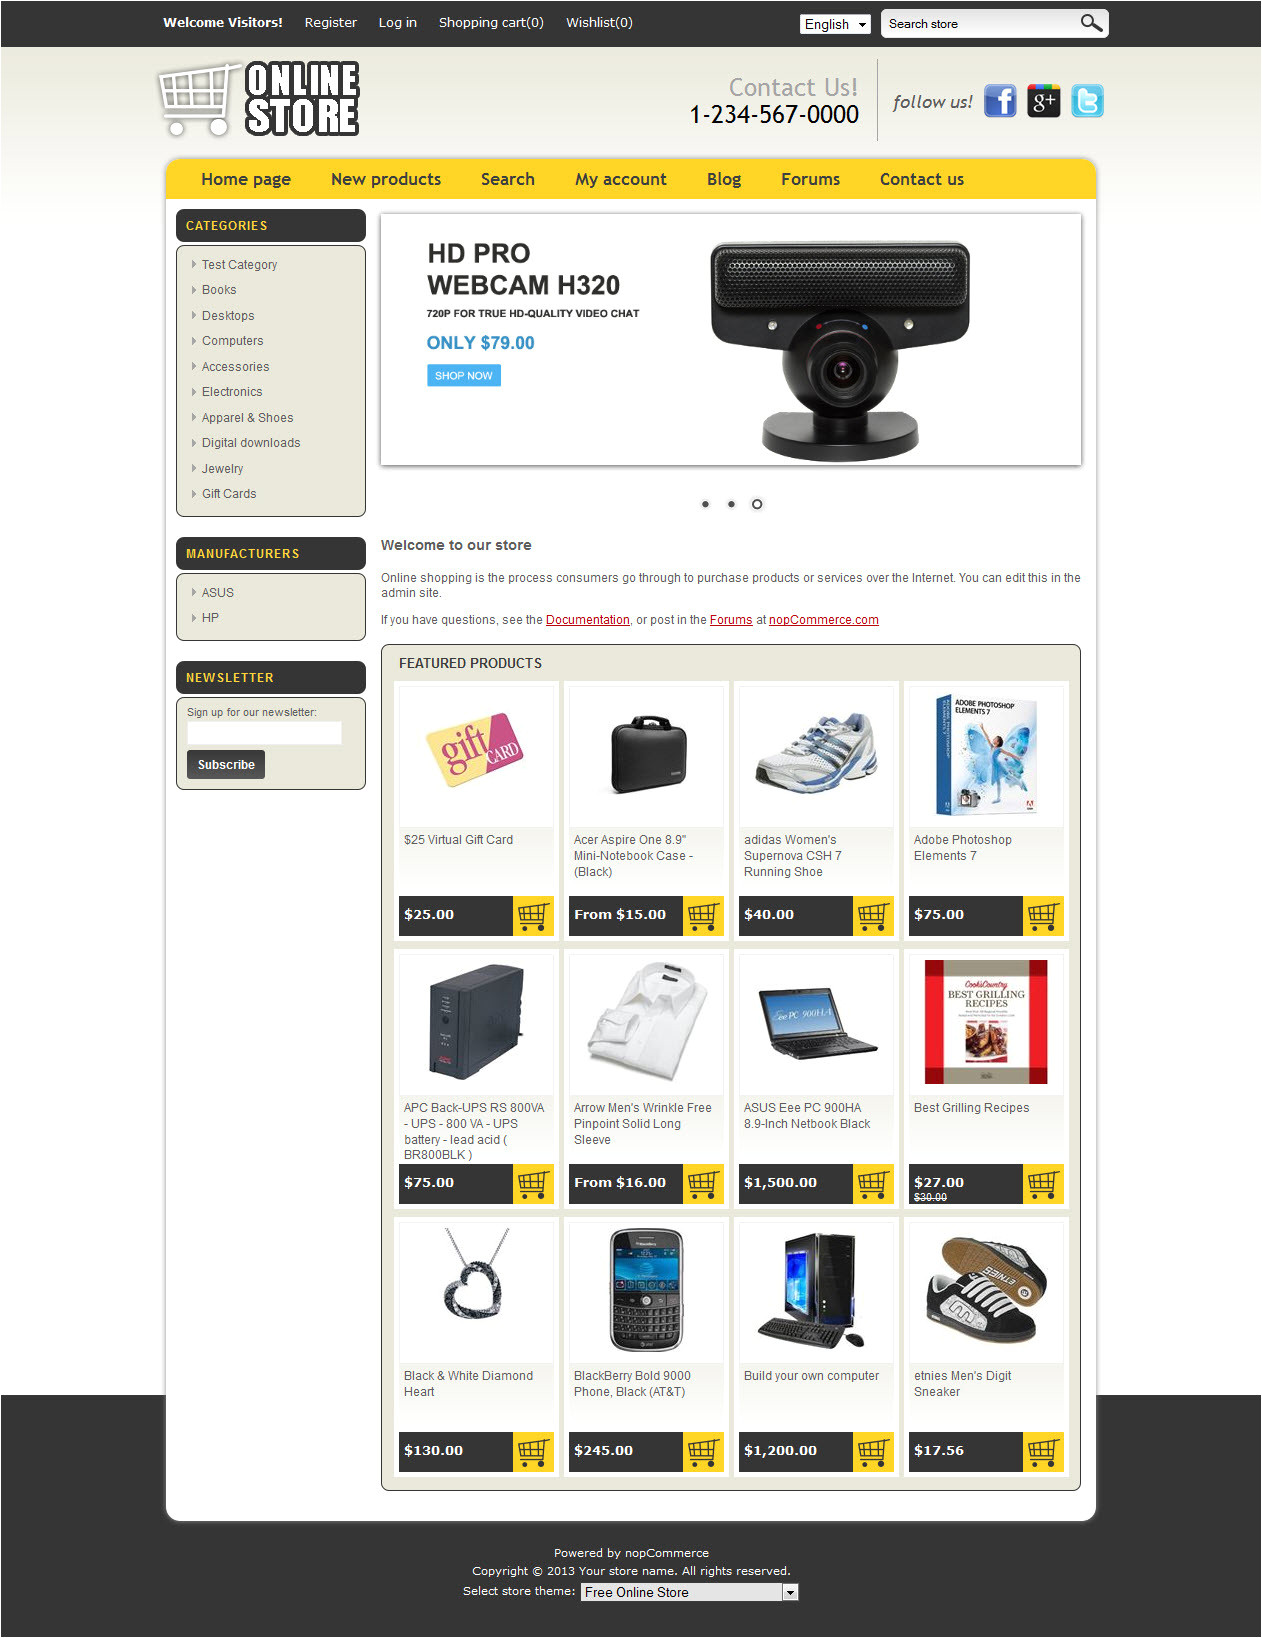 nopcommerce free 3 20 templates